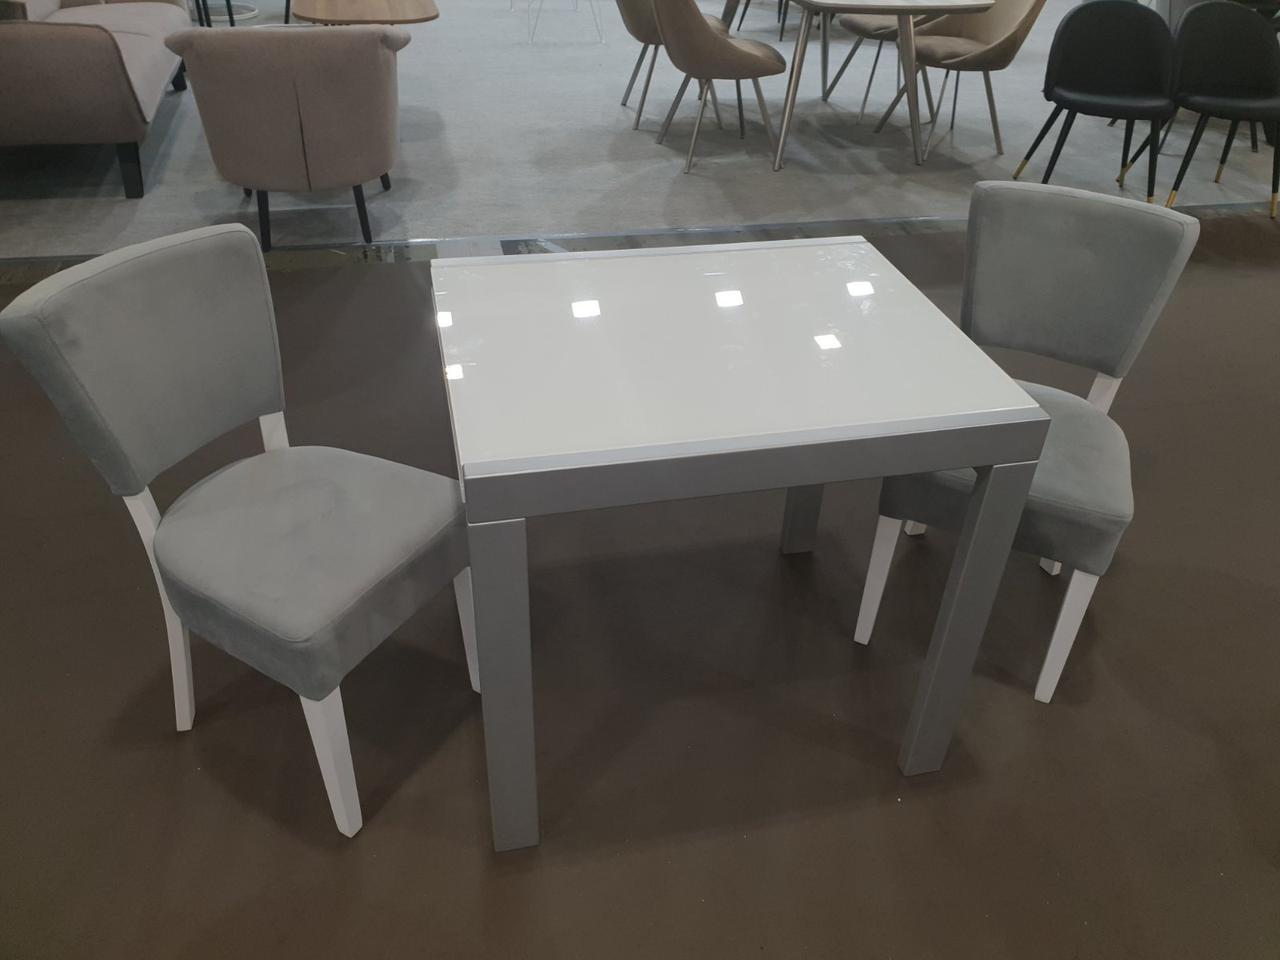 Стол Слайдер 815 серый с ультрабелым стеклом 815/1630х670х750 мм